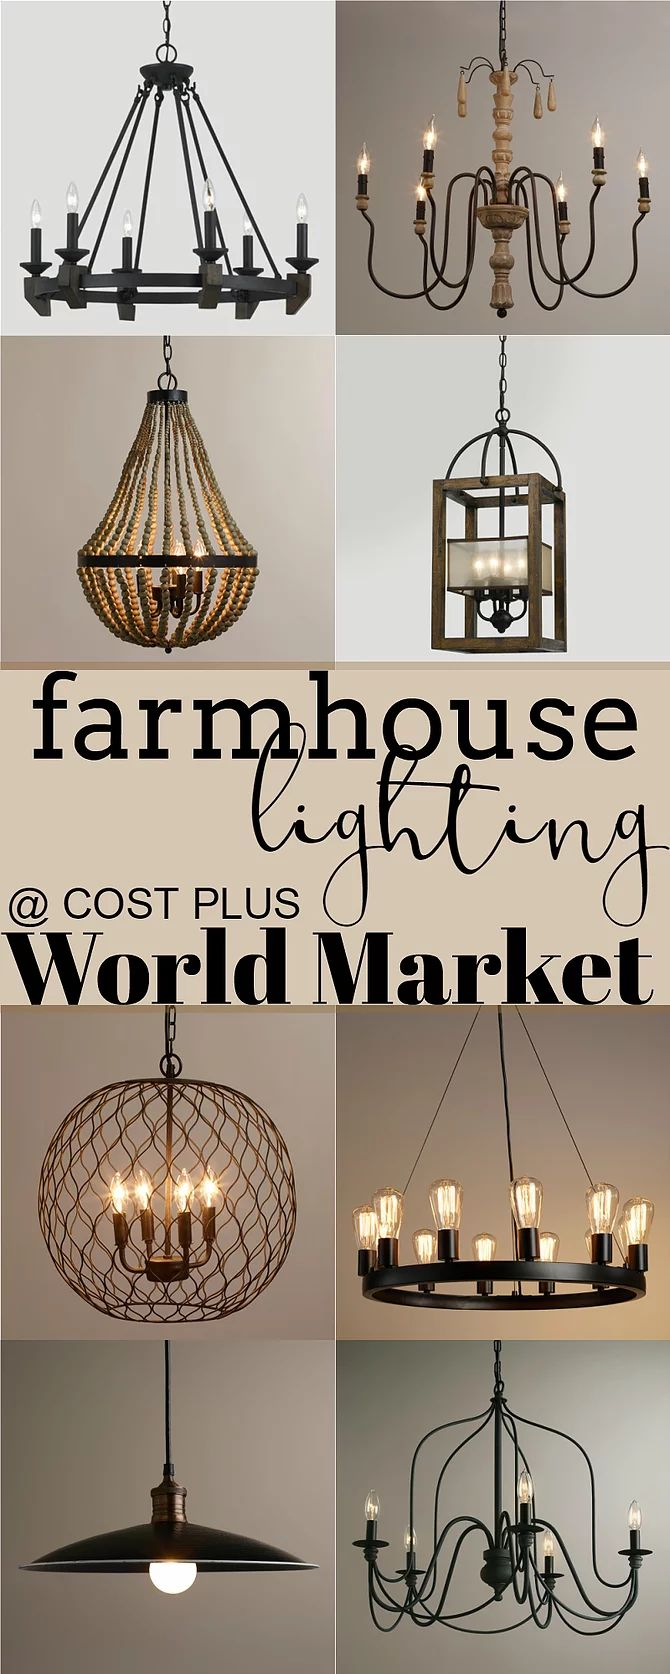 Farmhouse Lighting at Cost Plus World Market: Updated | suburbanfarmhouse